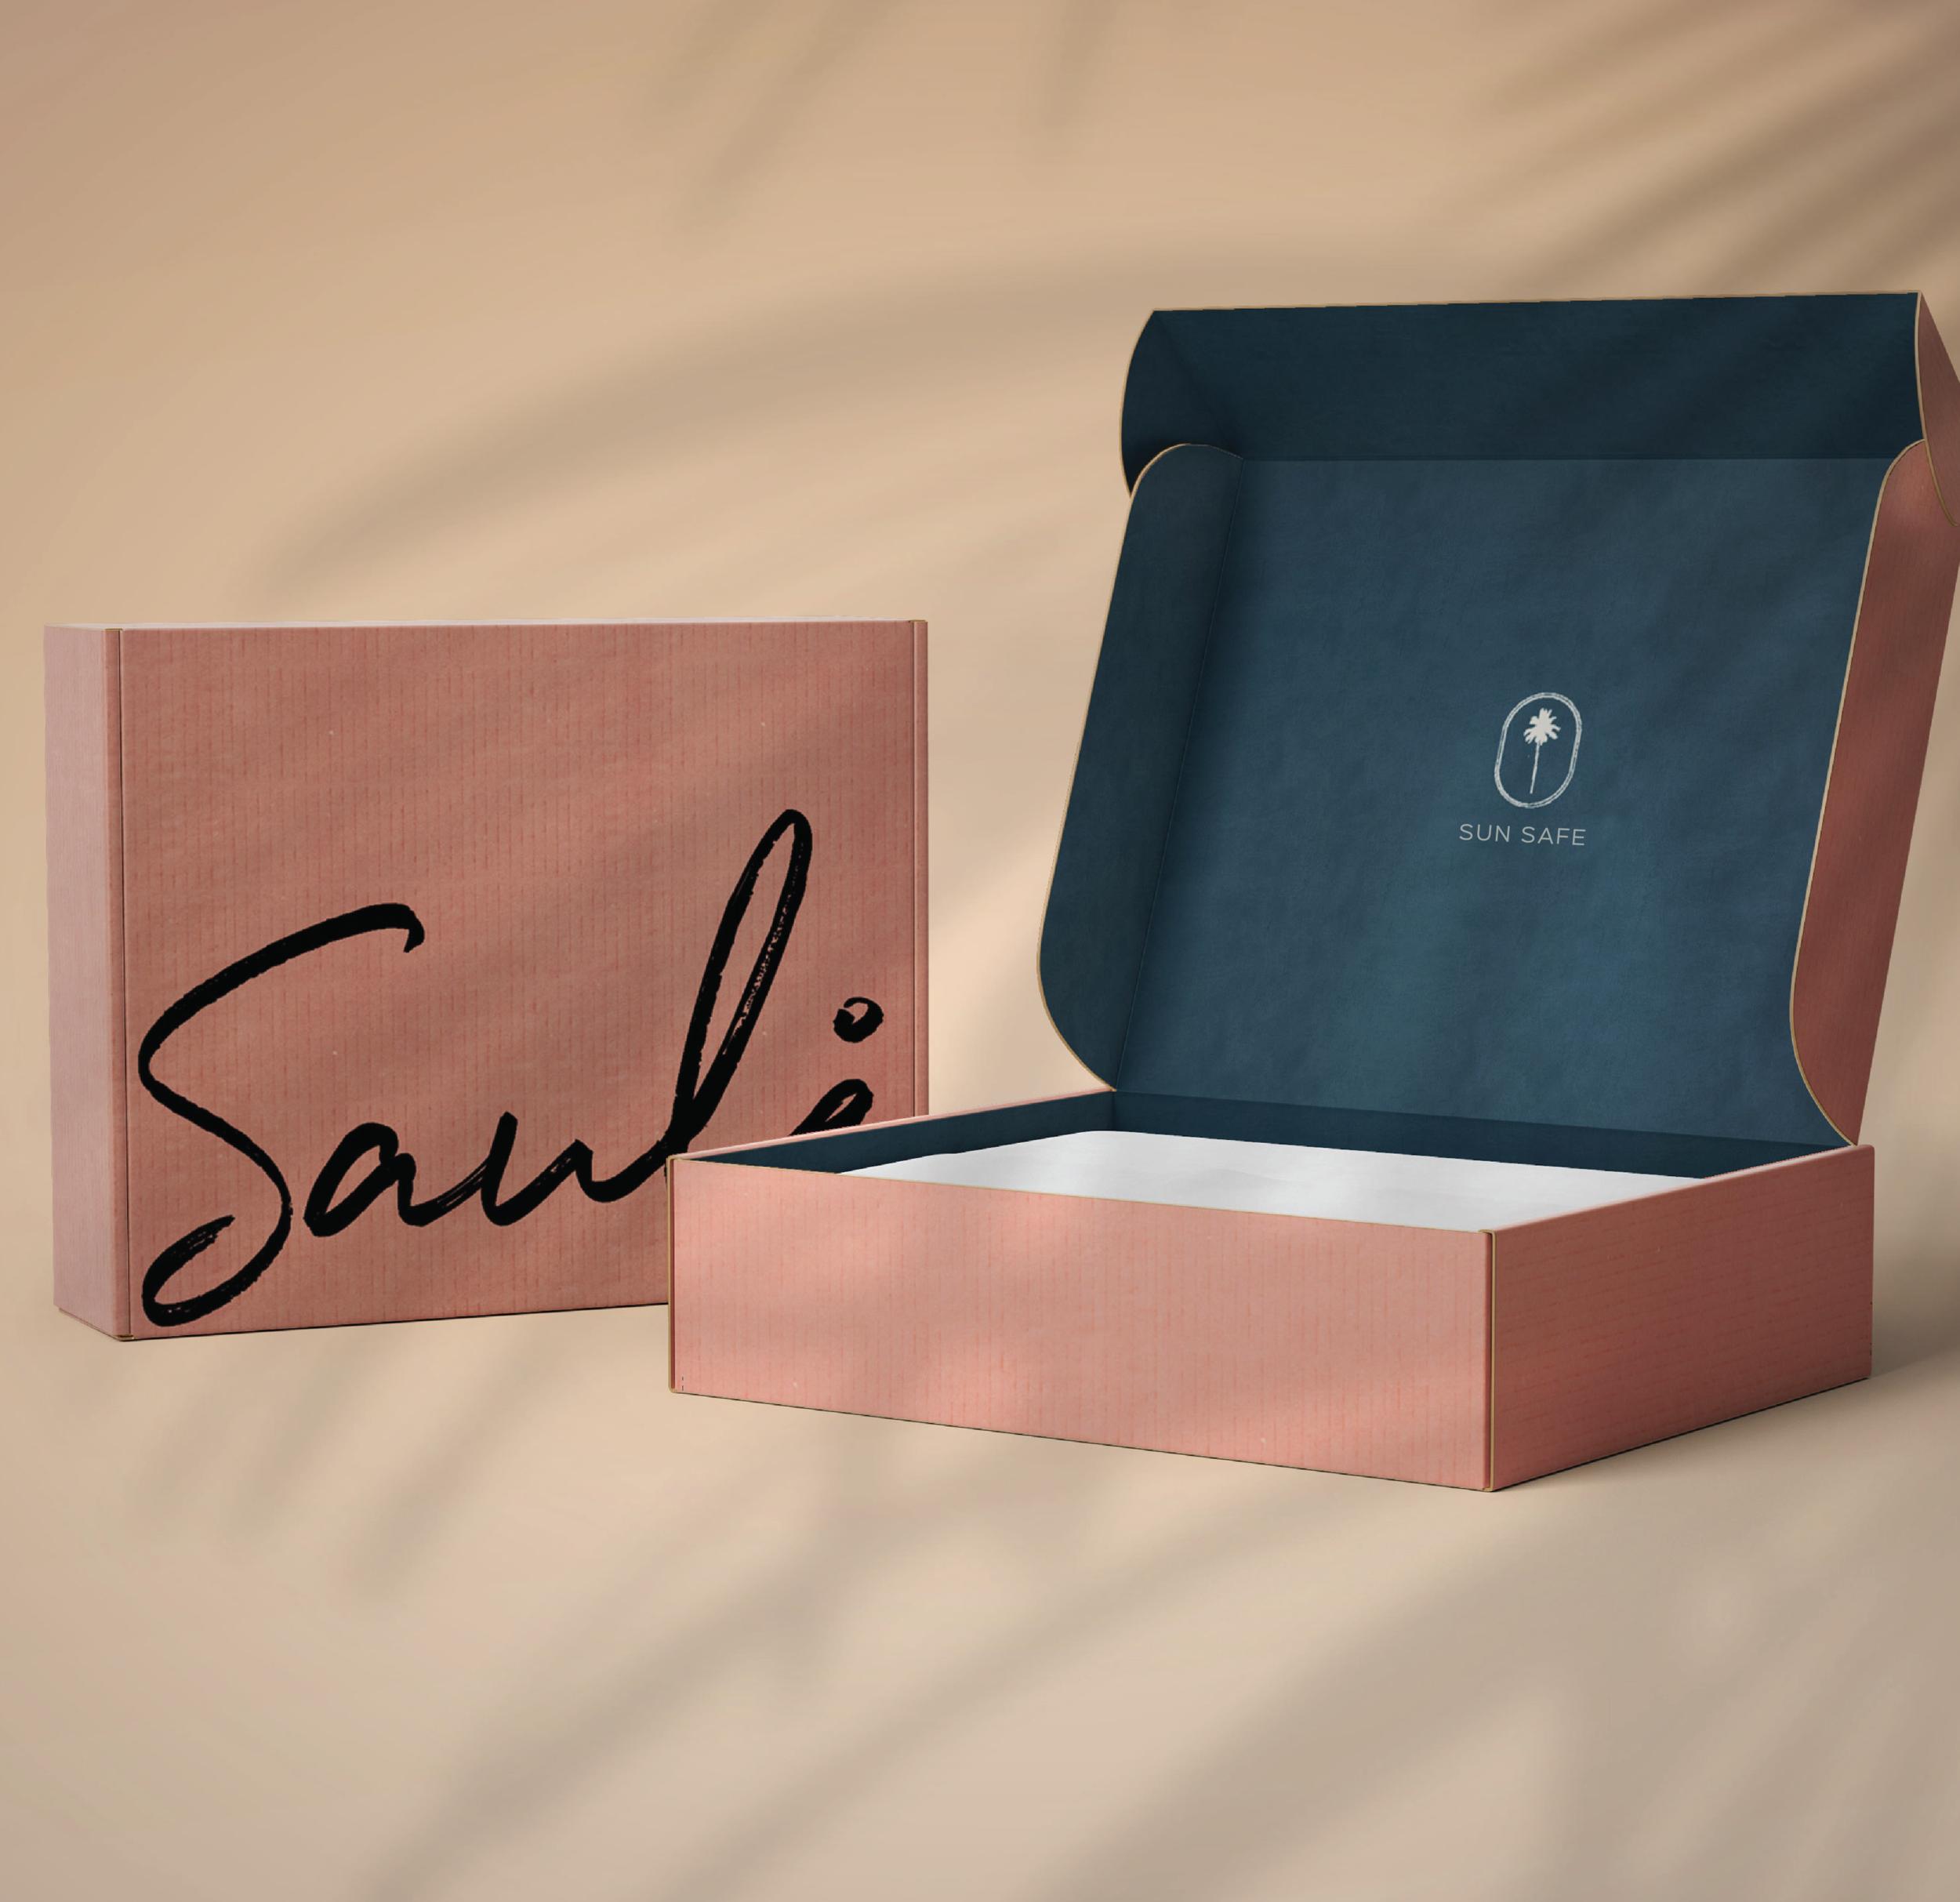 saule_box crop.png